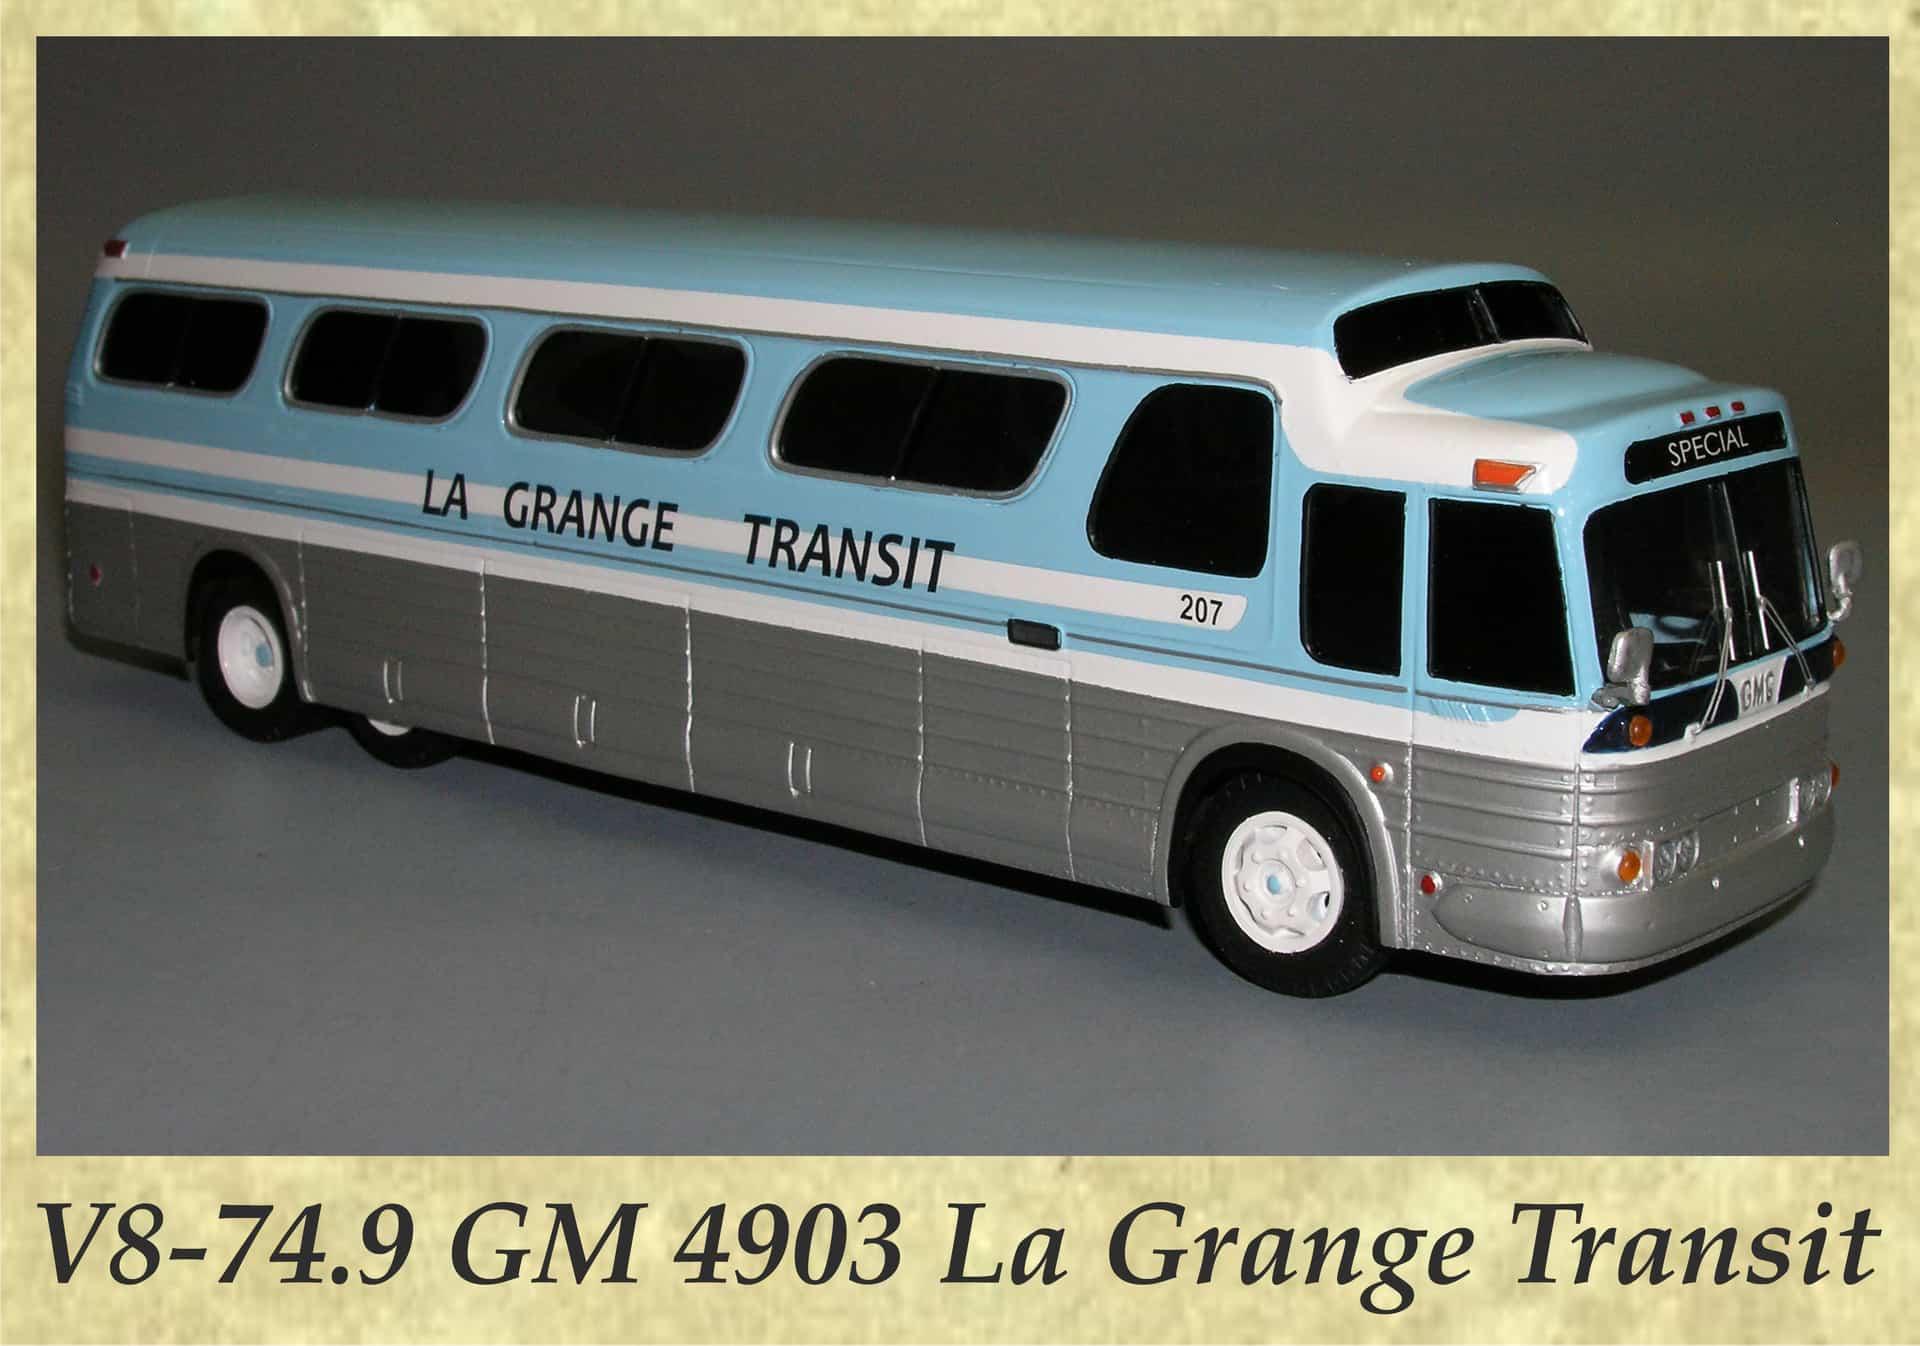 V8-74.9 GM 4903 La Grange Transit